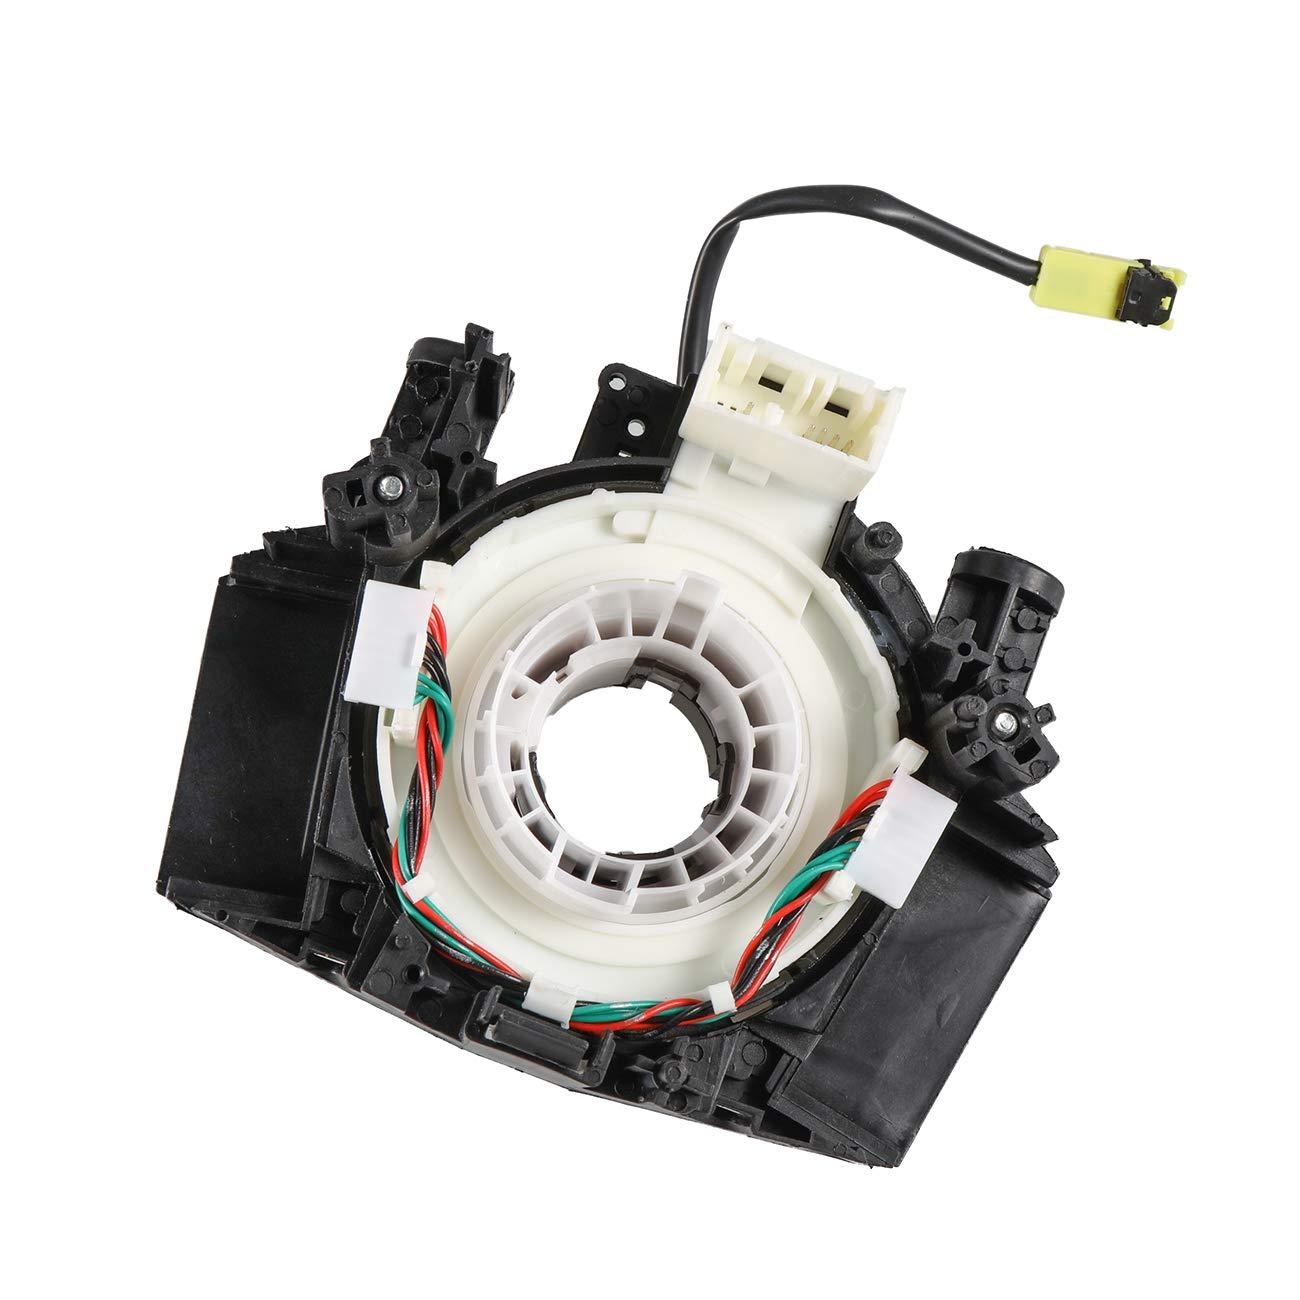 Wenyu 25567-EB301 Clock Spring Airbag Cable for Nissan Tiida Pathfinder 2005-2013